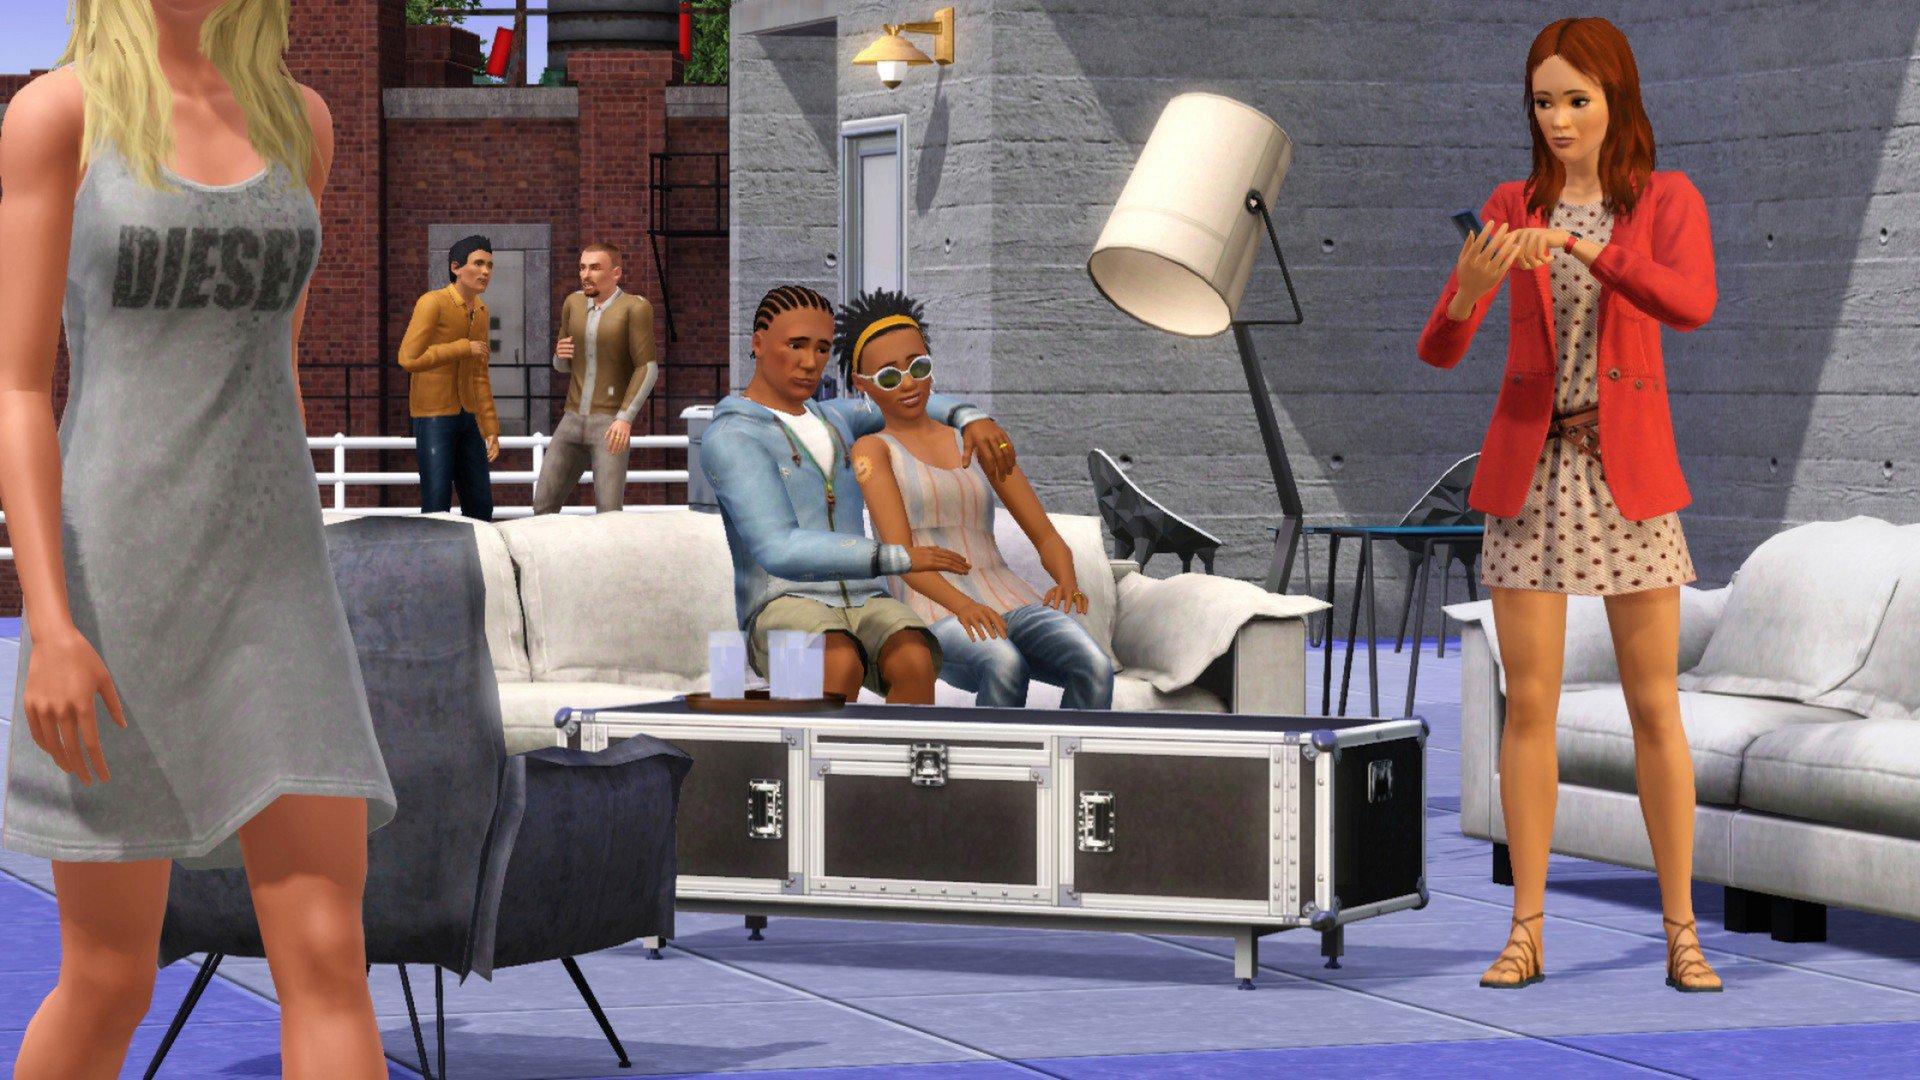 The Sims 3 Diesel 2